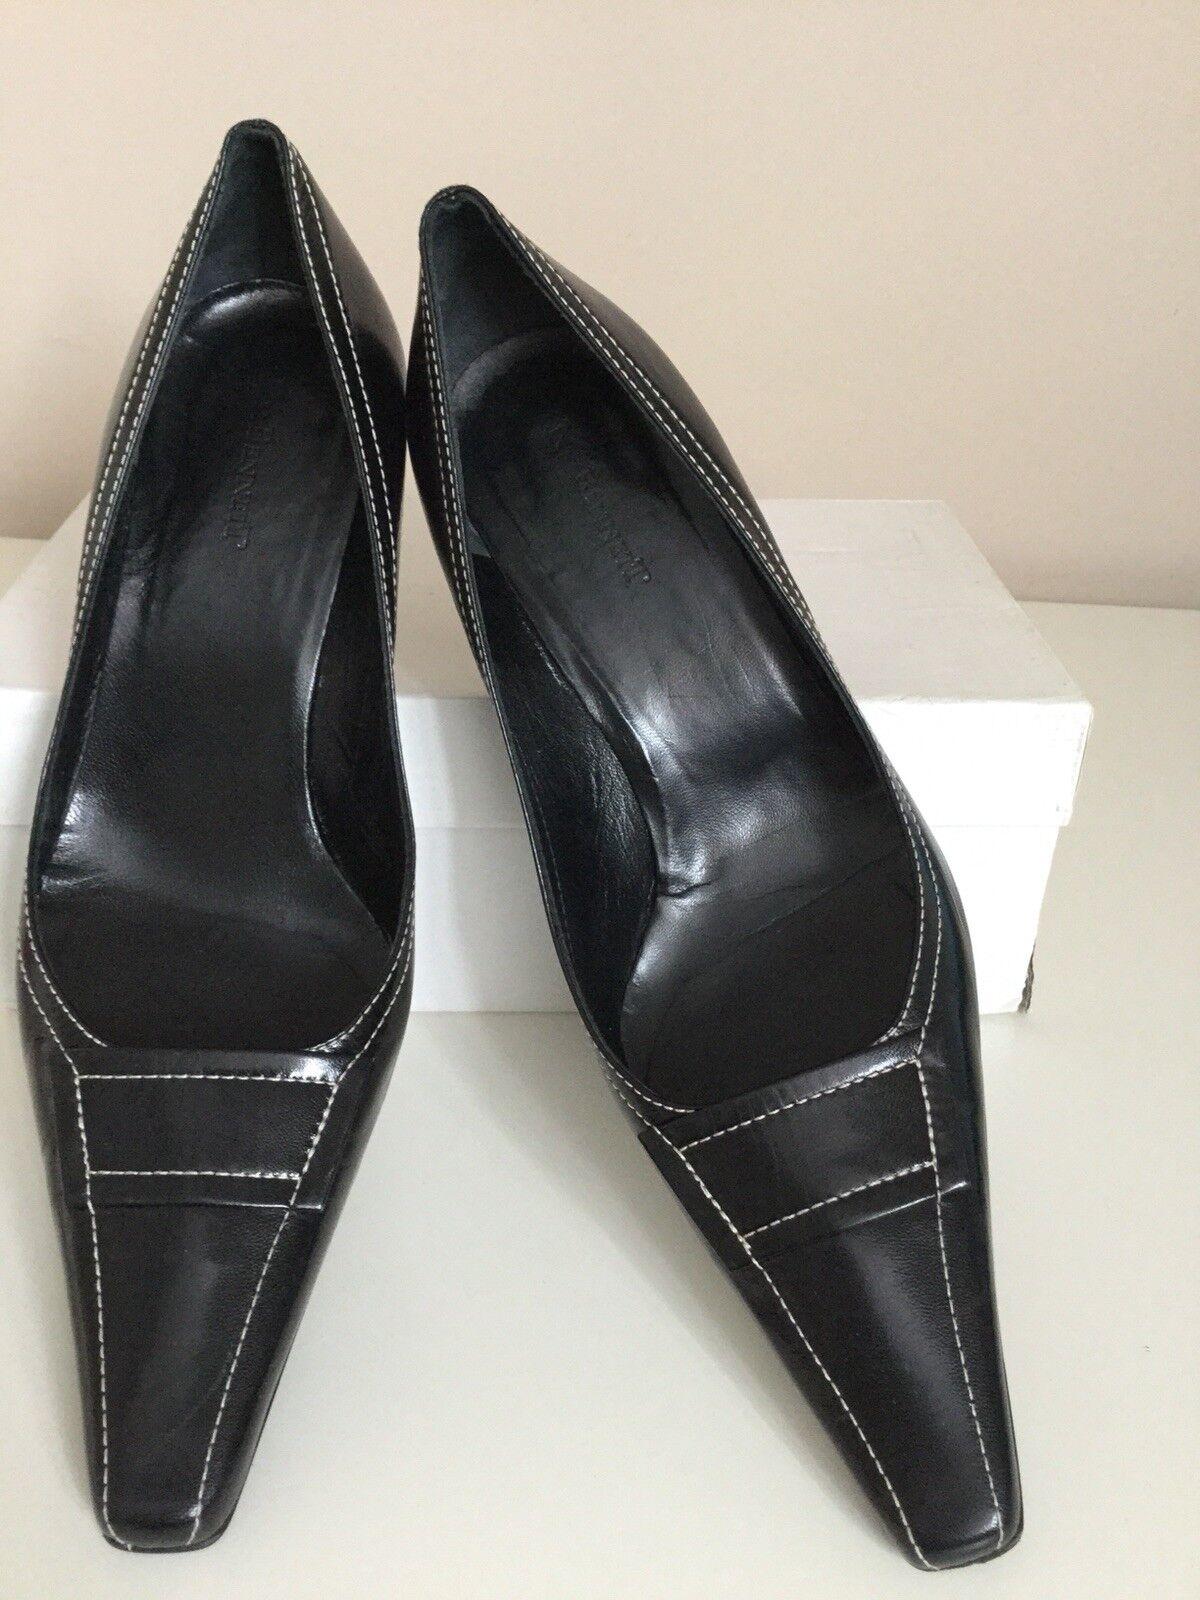 LK Bennett Noir Mia Cour Chaussures Taille 40.5